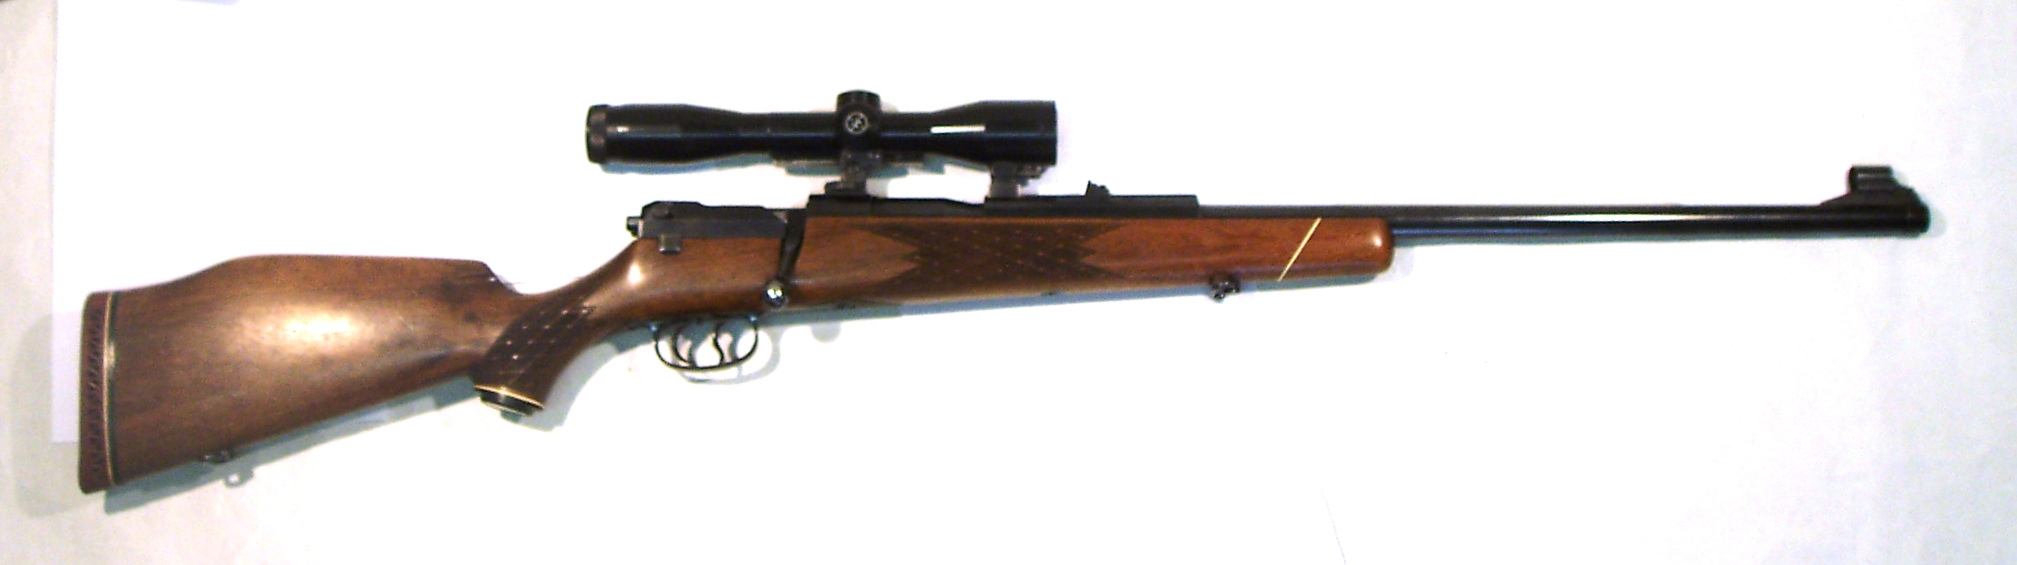 Rifle Mauser modelo 66